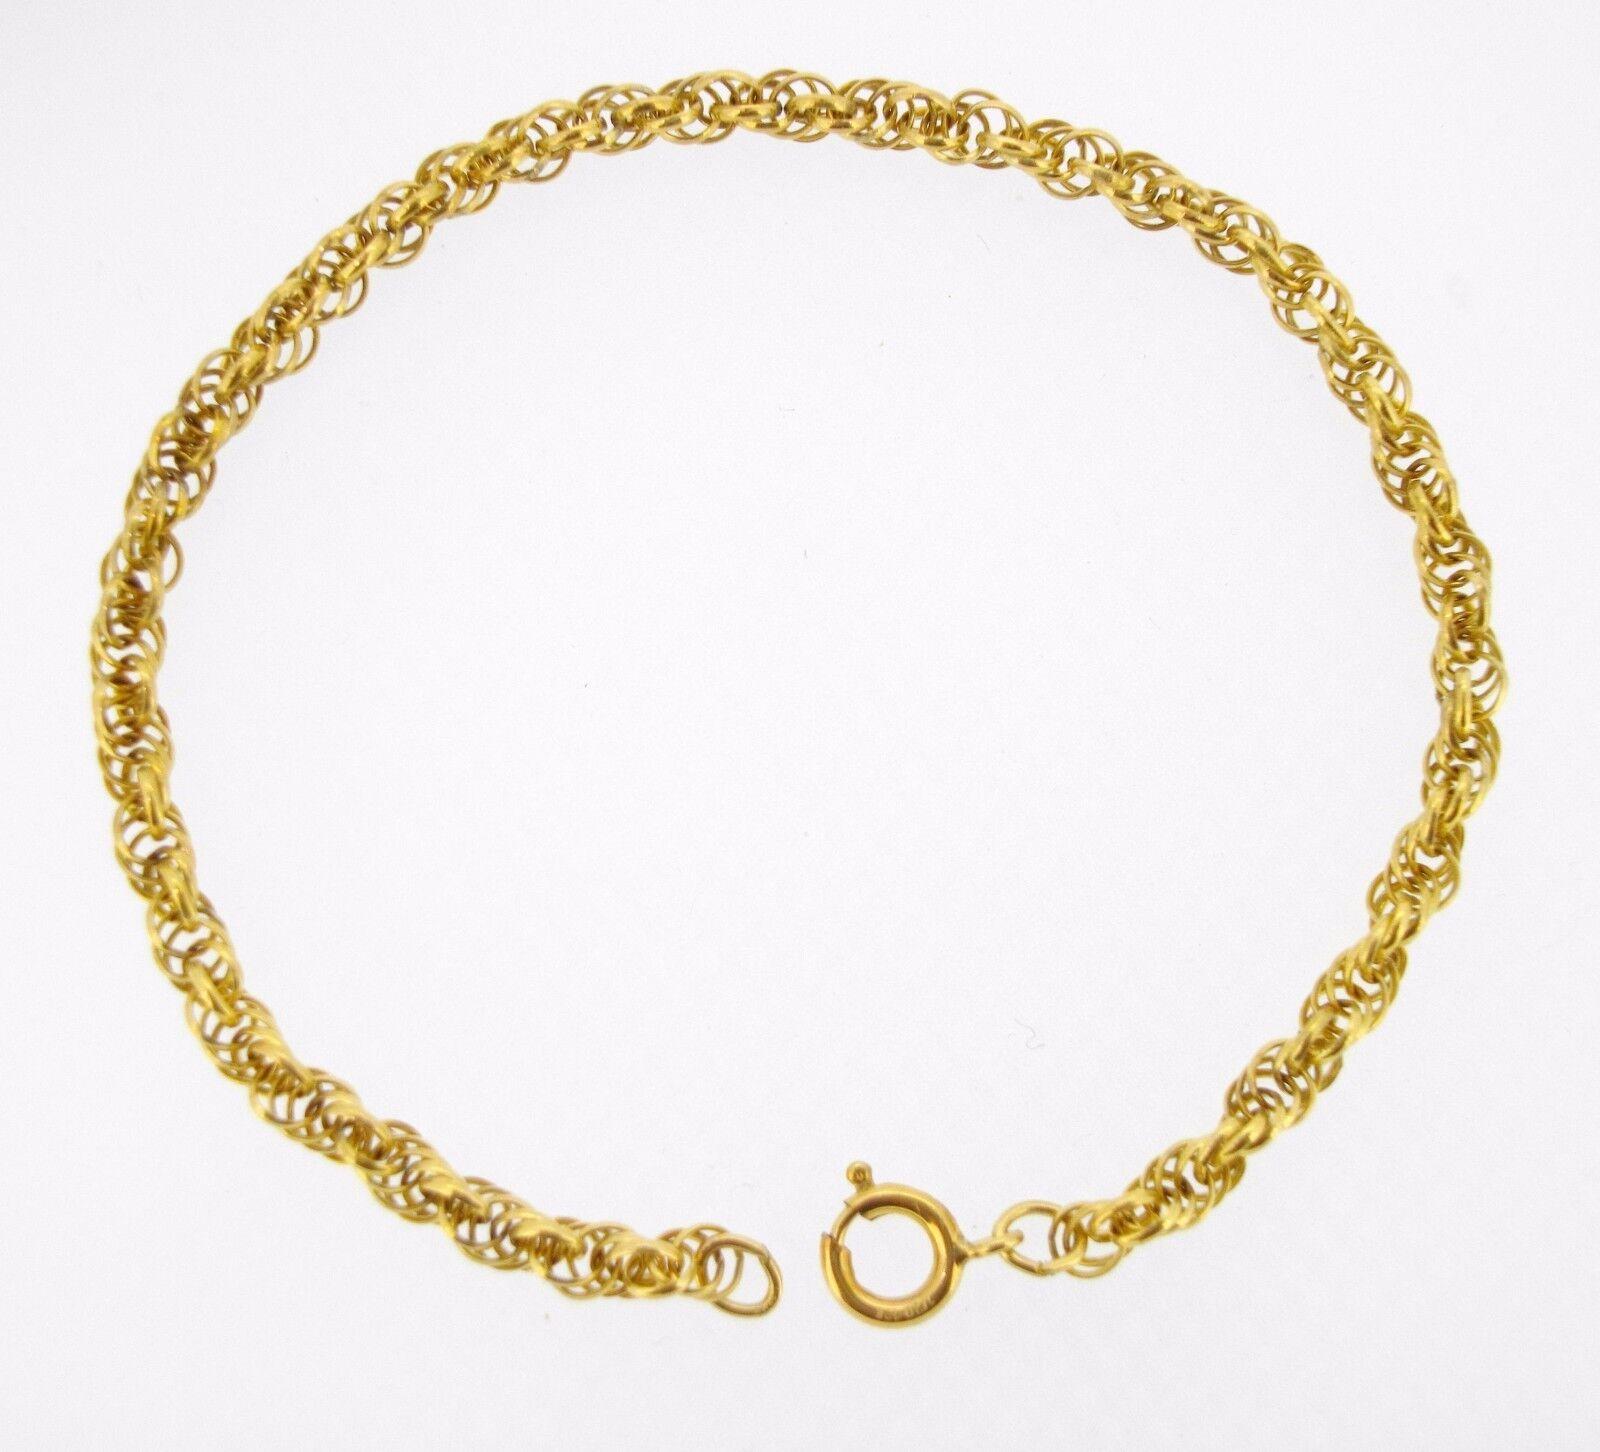 Bracelet Sweet brand gold filled ROPE link chain